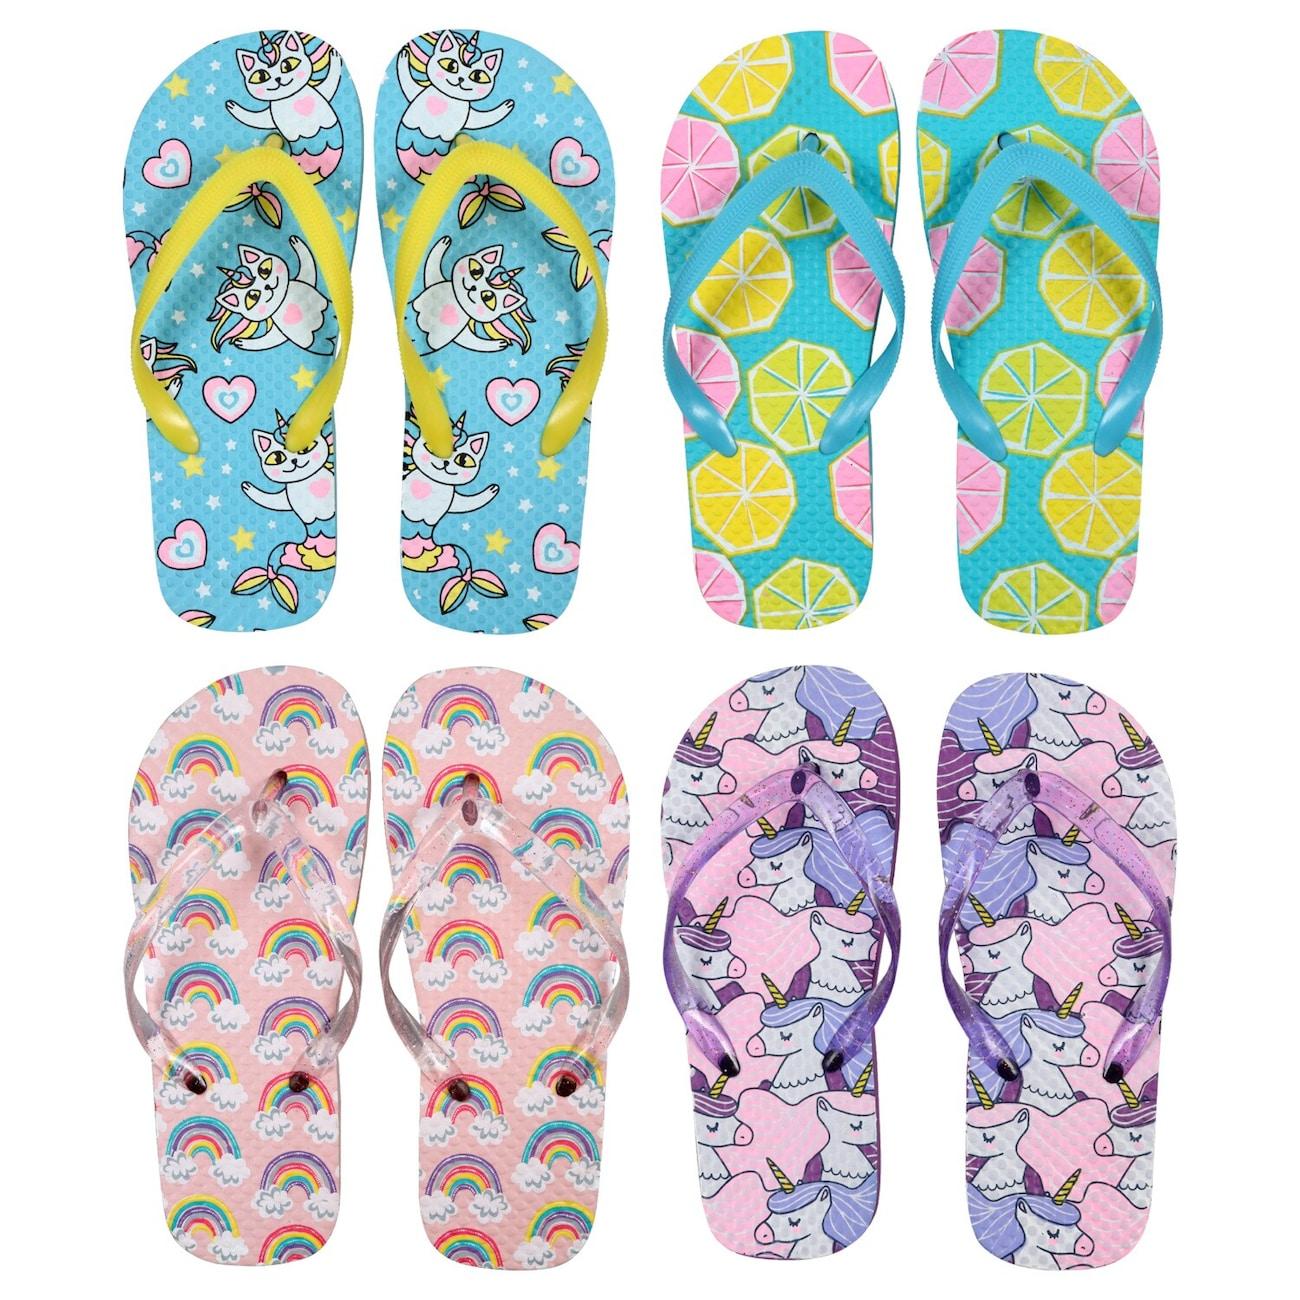 c8512083d Girls Fun Printed Rubber Flip Flops